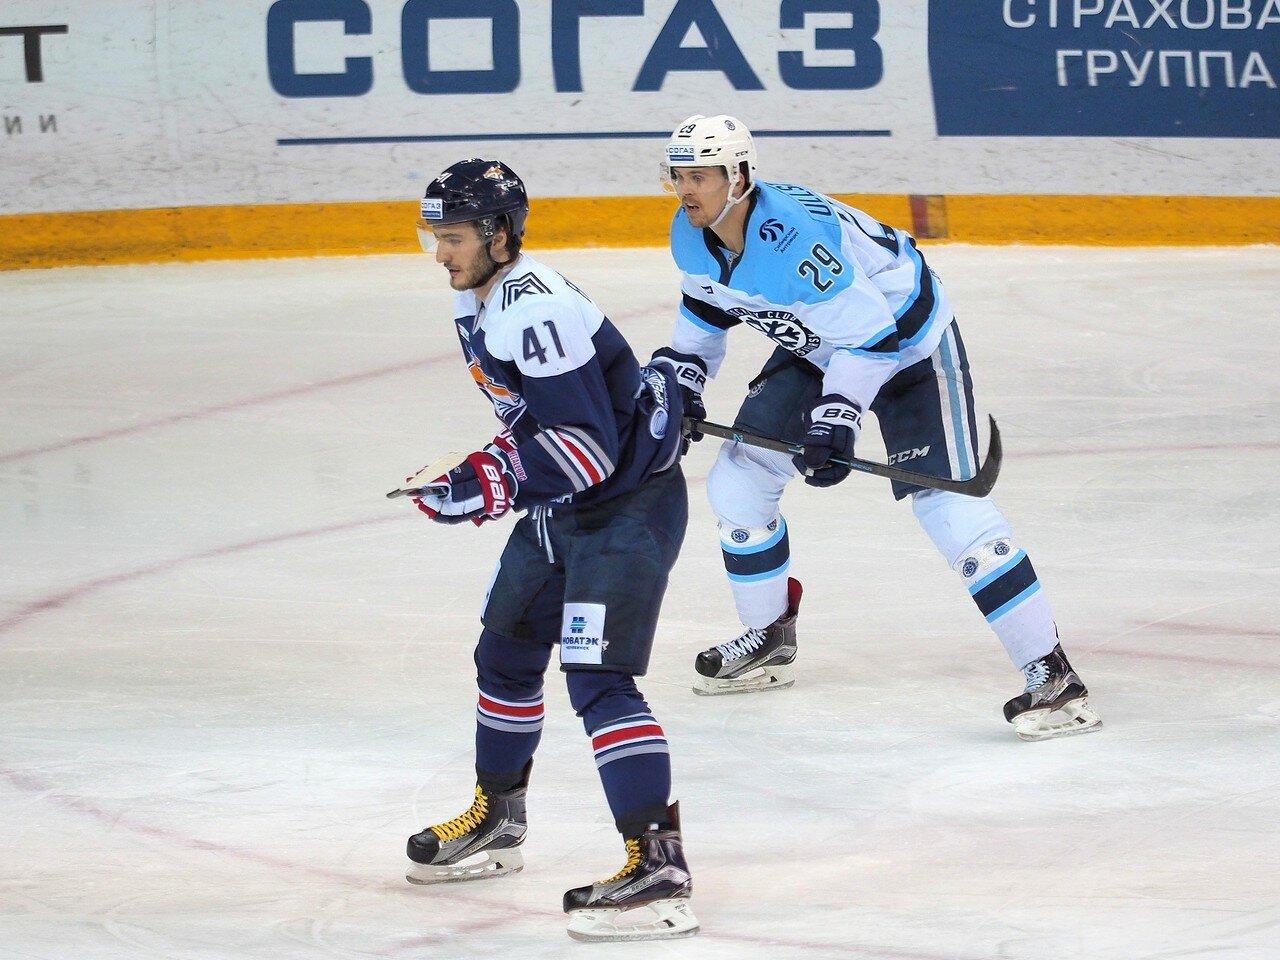 96Восток 1/2 плей-офф Металлург - Сибирь 08.03.2016